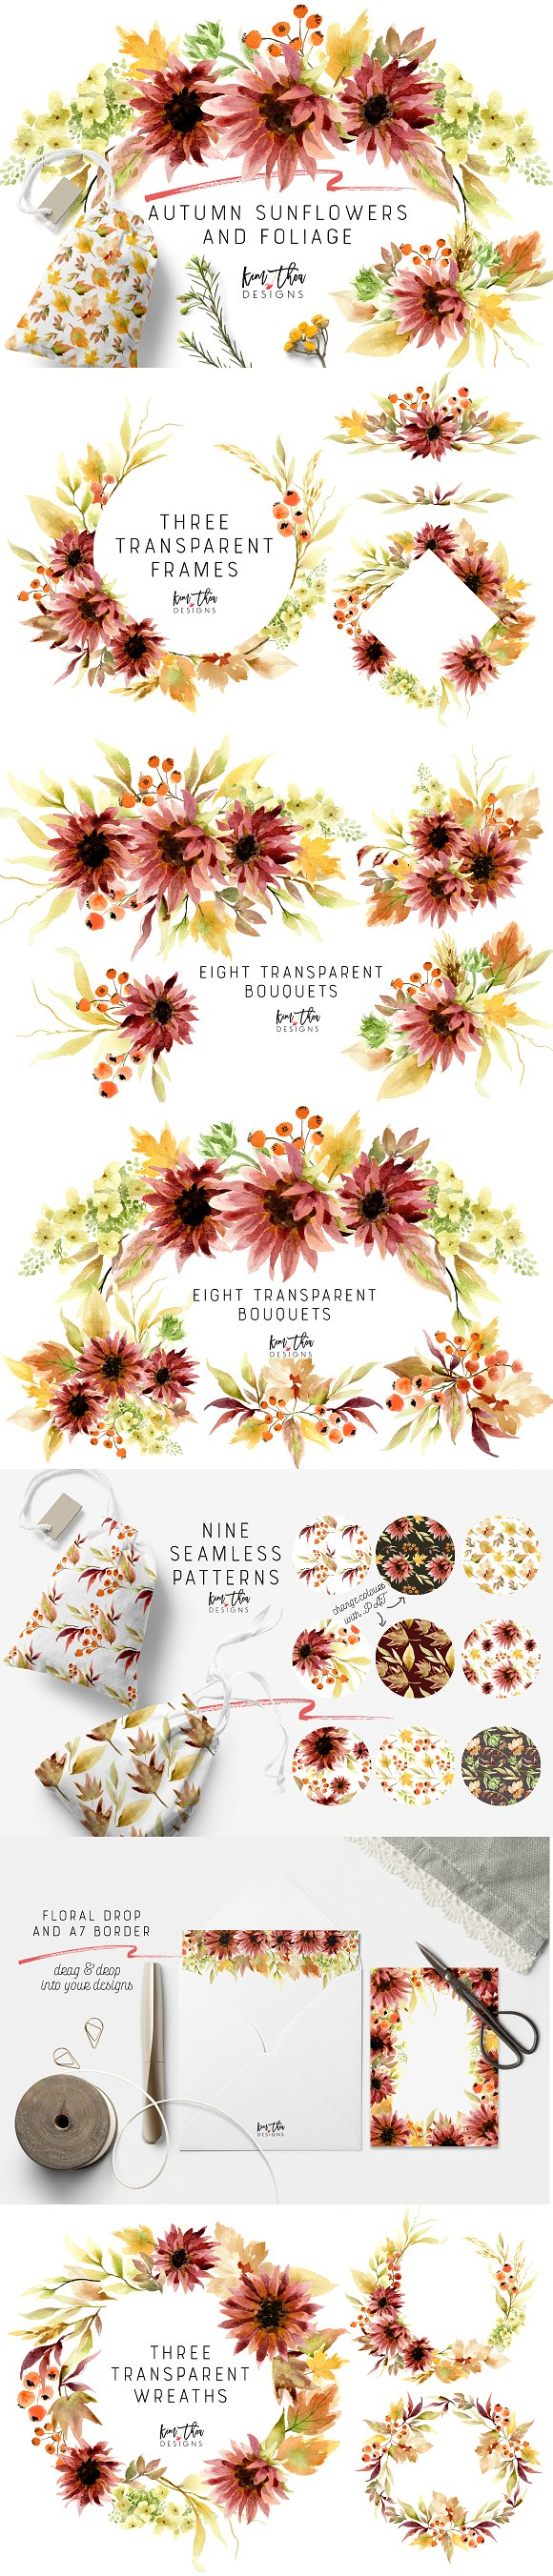 NEW Autumn Sunflowers And Foliage